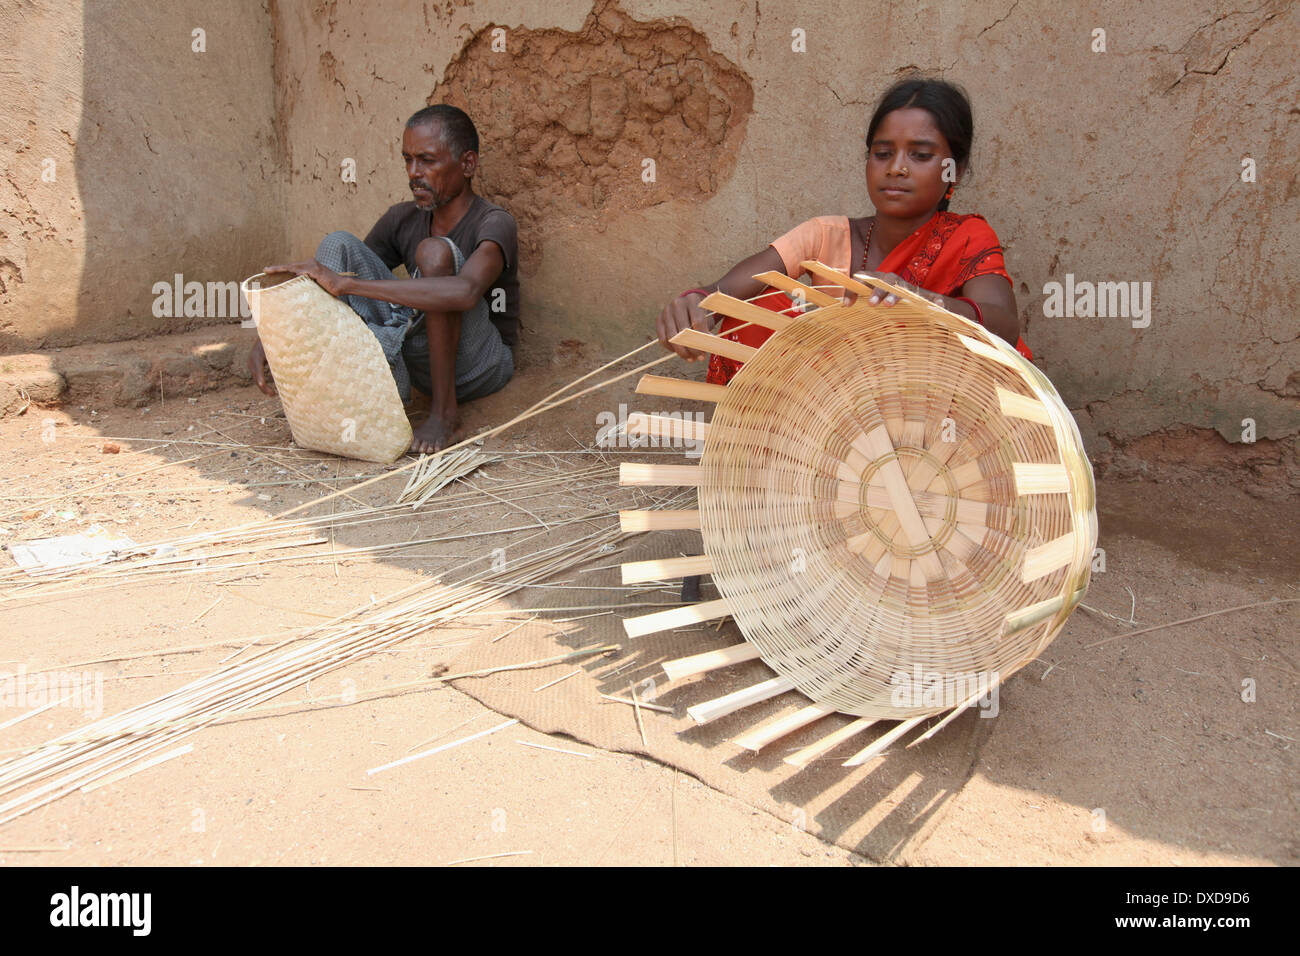 Tribal couple making baskets with dry bamboo strips. Uraov tribe. Baludih village, Bokaro district, Jharkhand, India - Stock Image